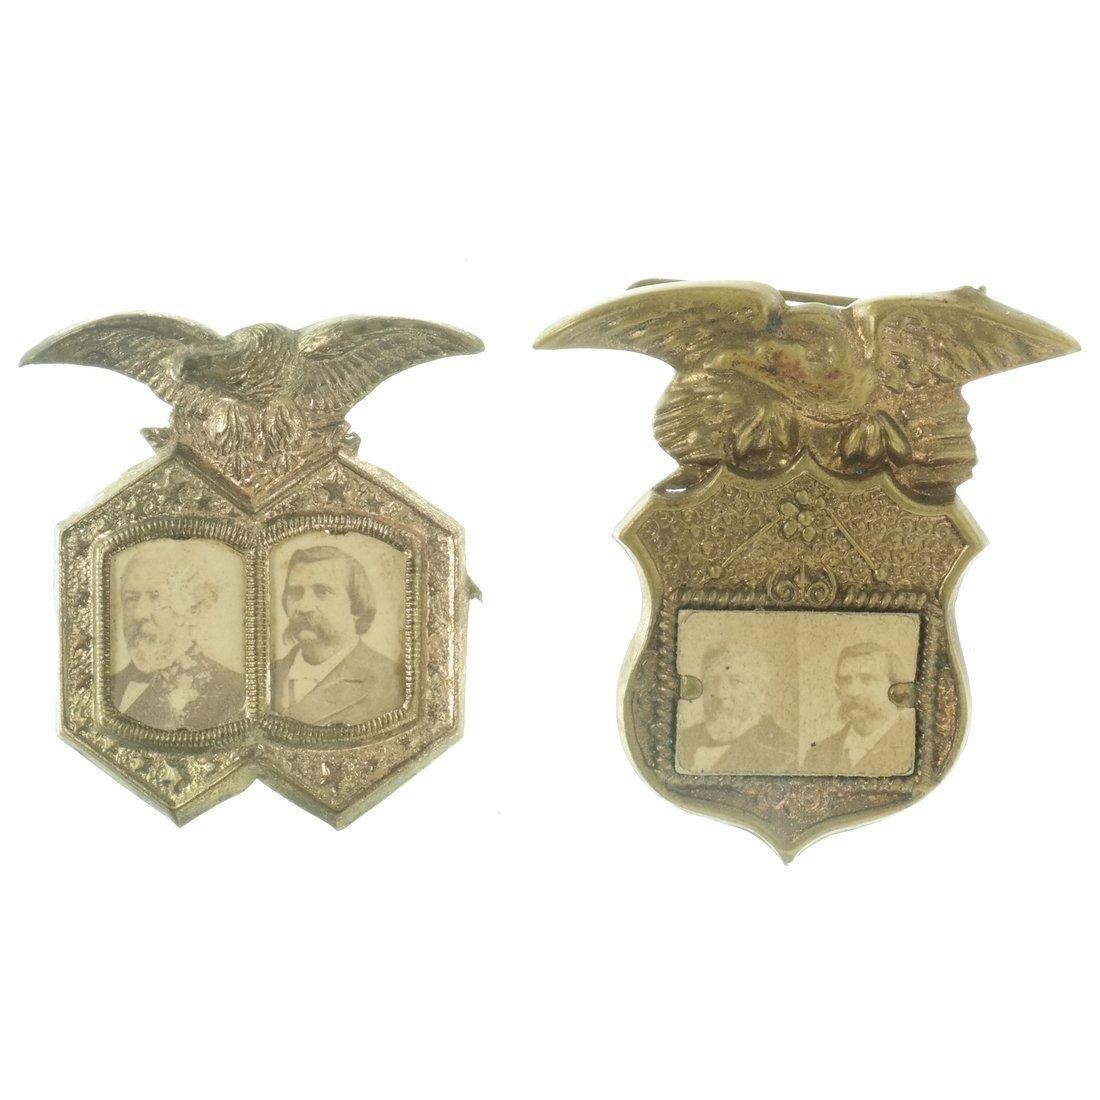 Blaine & Logan Two 1884 Jugate Shell Badges